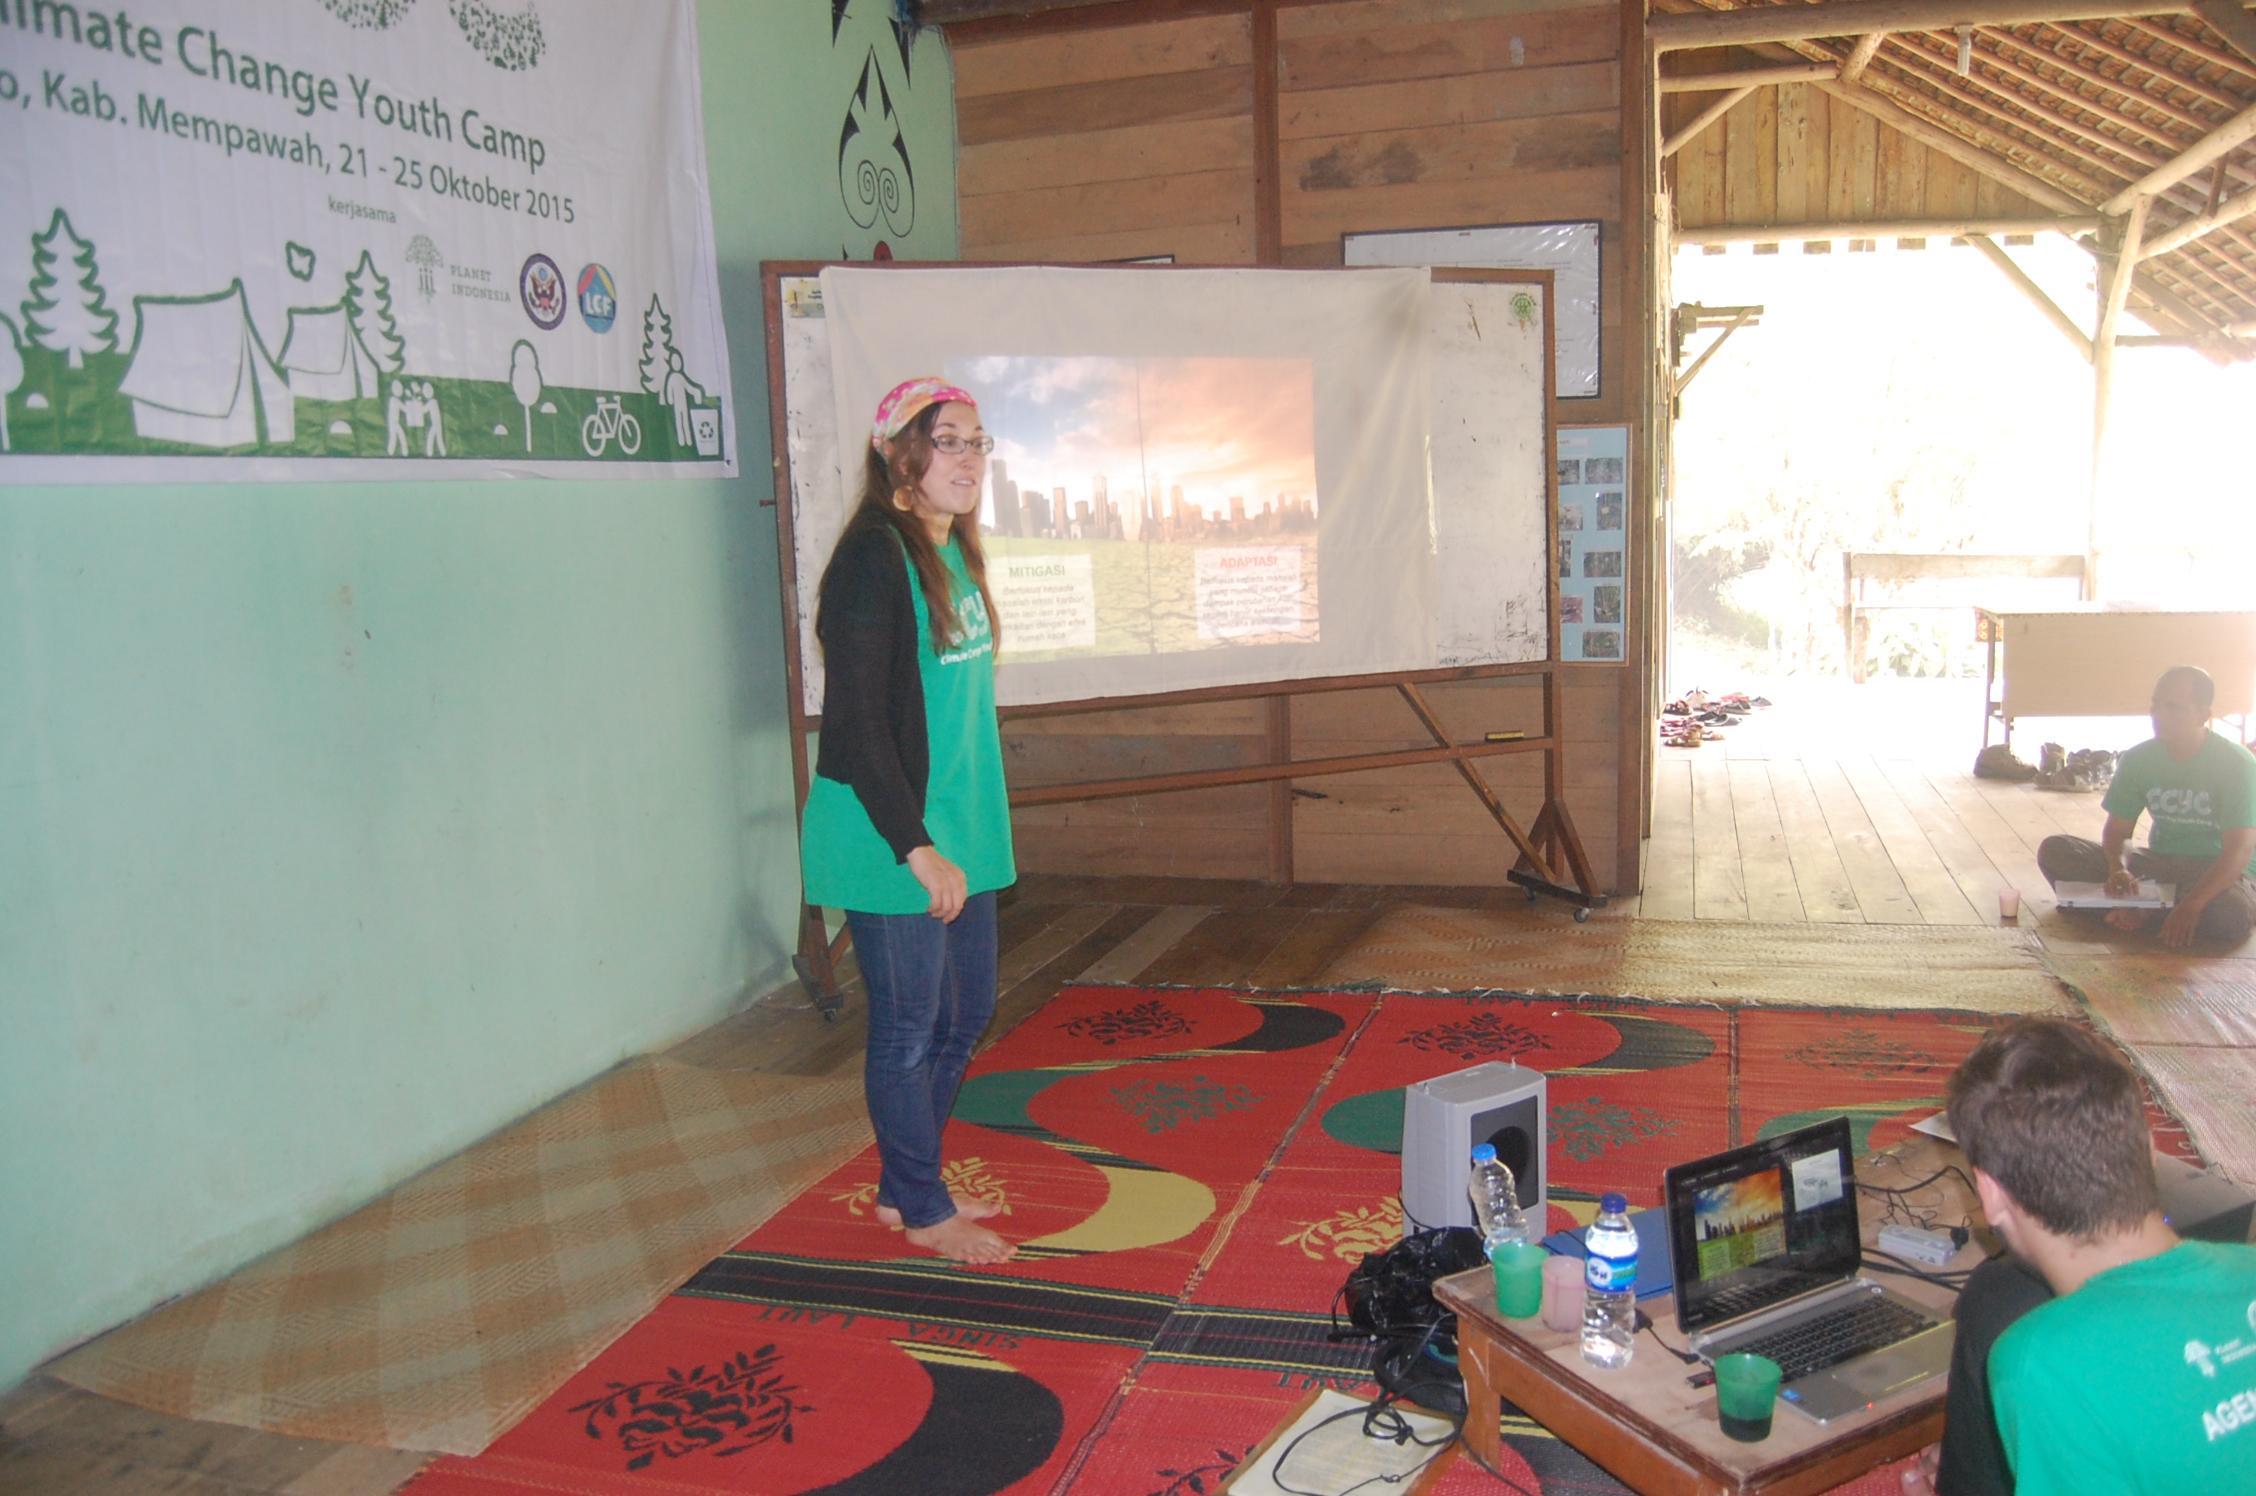 Erica Pohnan (Yayasan ASRI) teaching about Climate Change Mitigation and Adaptation